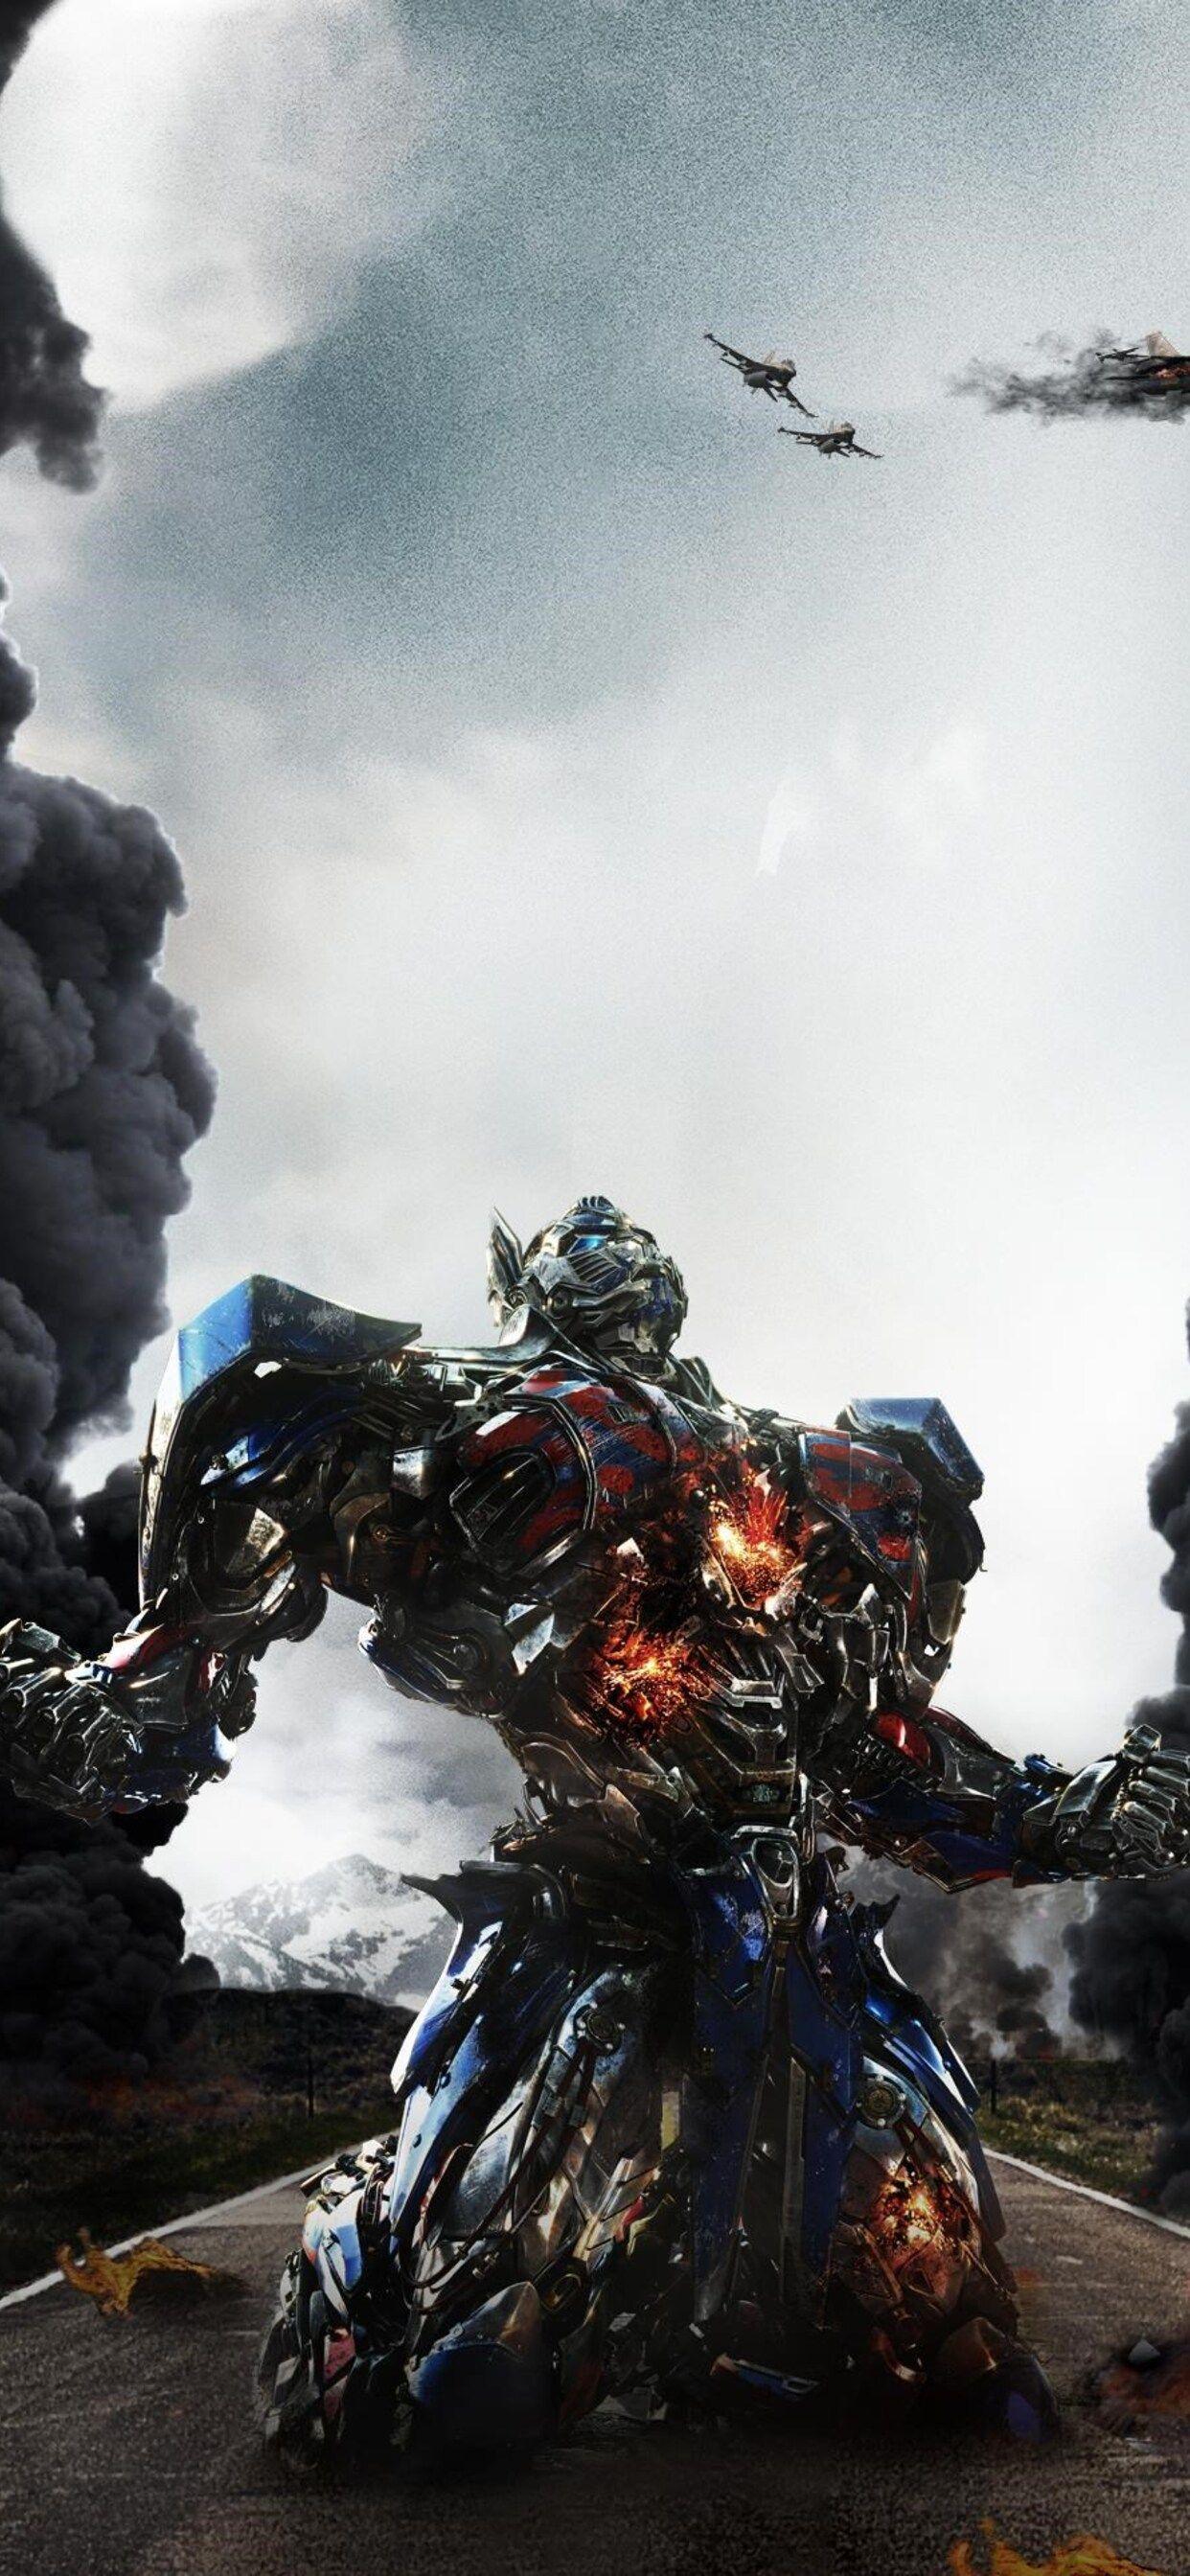 Transformers 5 4K Wallpapers - Top Free Transformers 5 4K ...